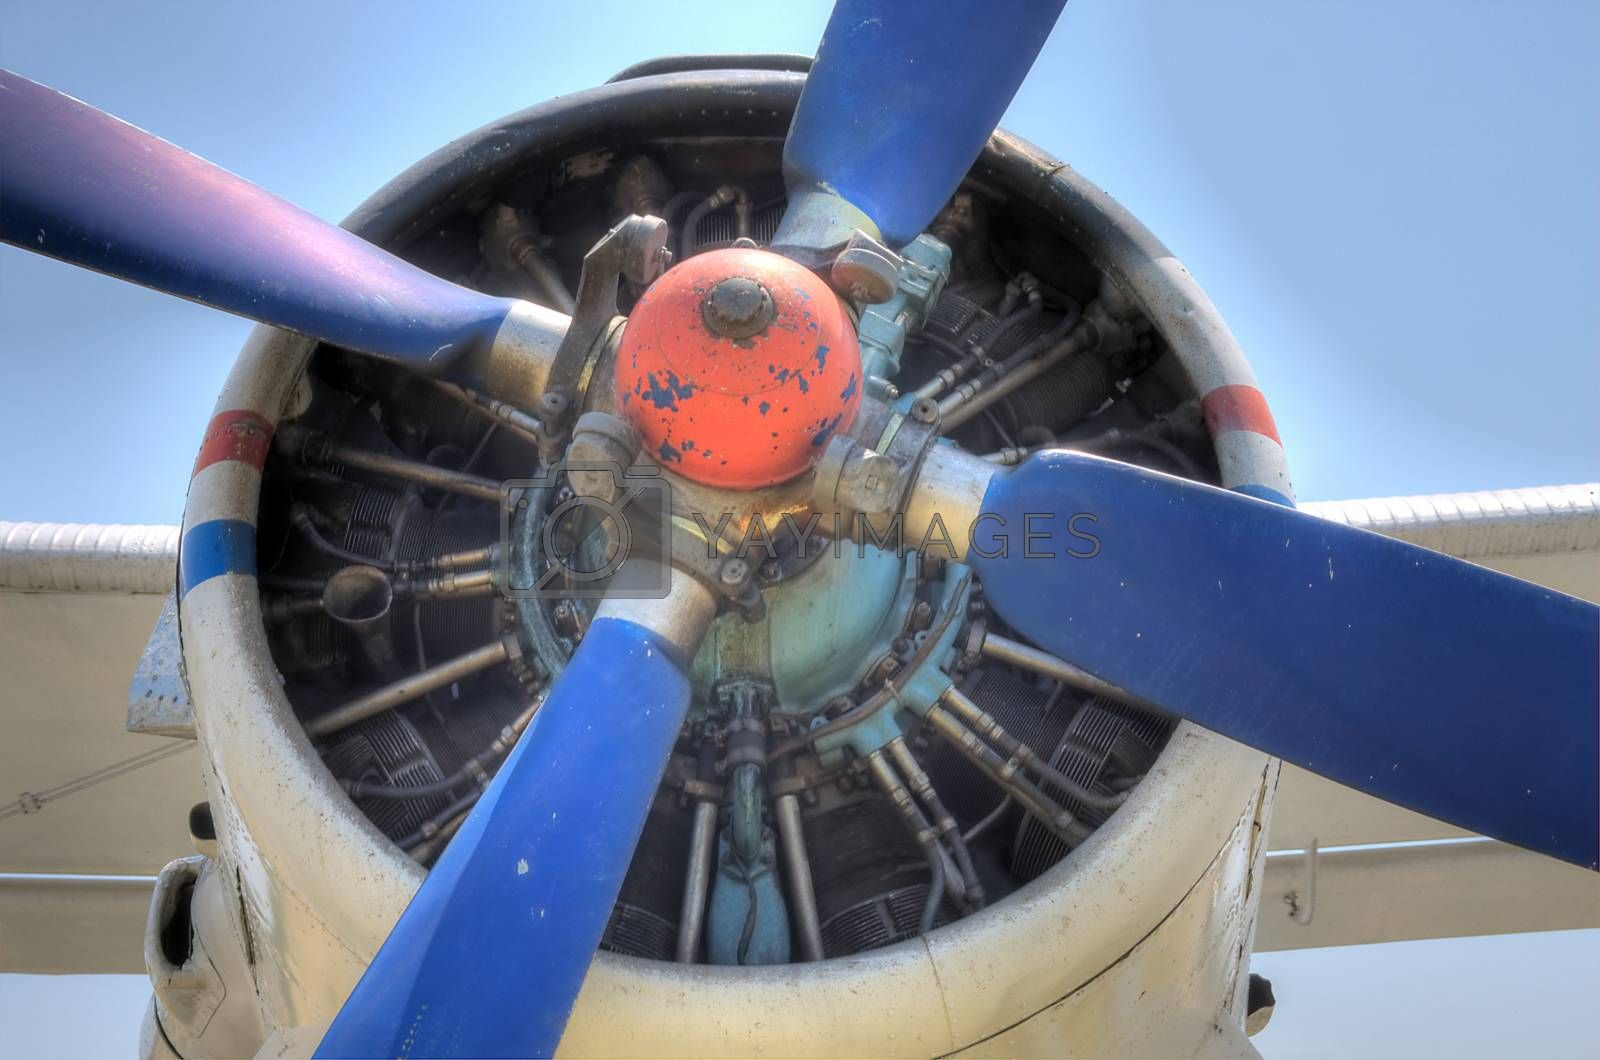 HDR Antonov 2 Plane Propeller engine detail by shoricelu